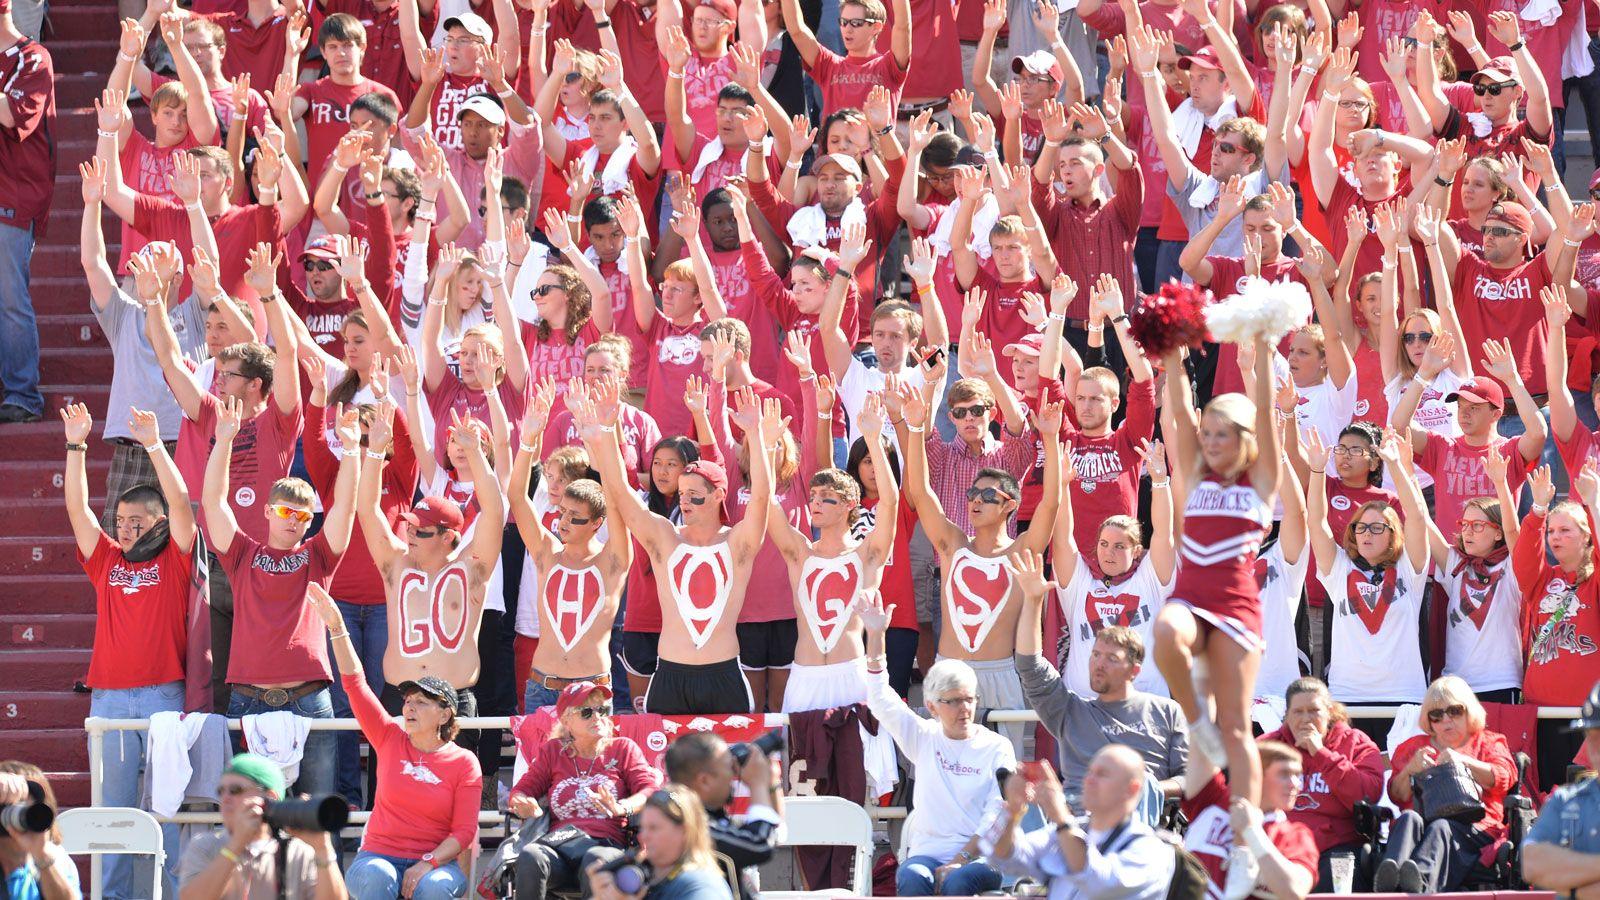 SEC schools emphasize fan engagement for football